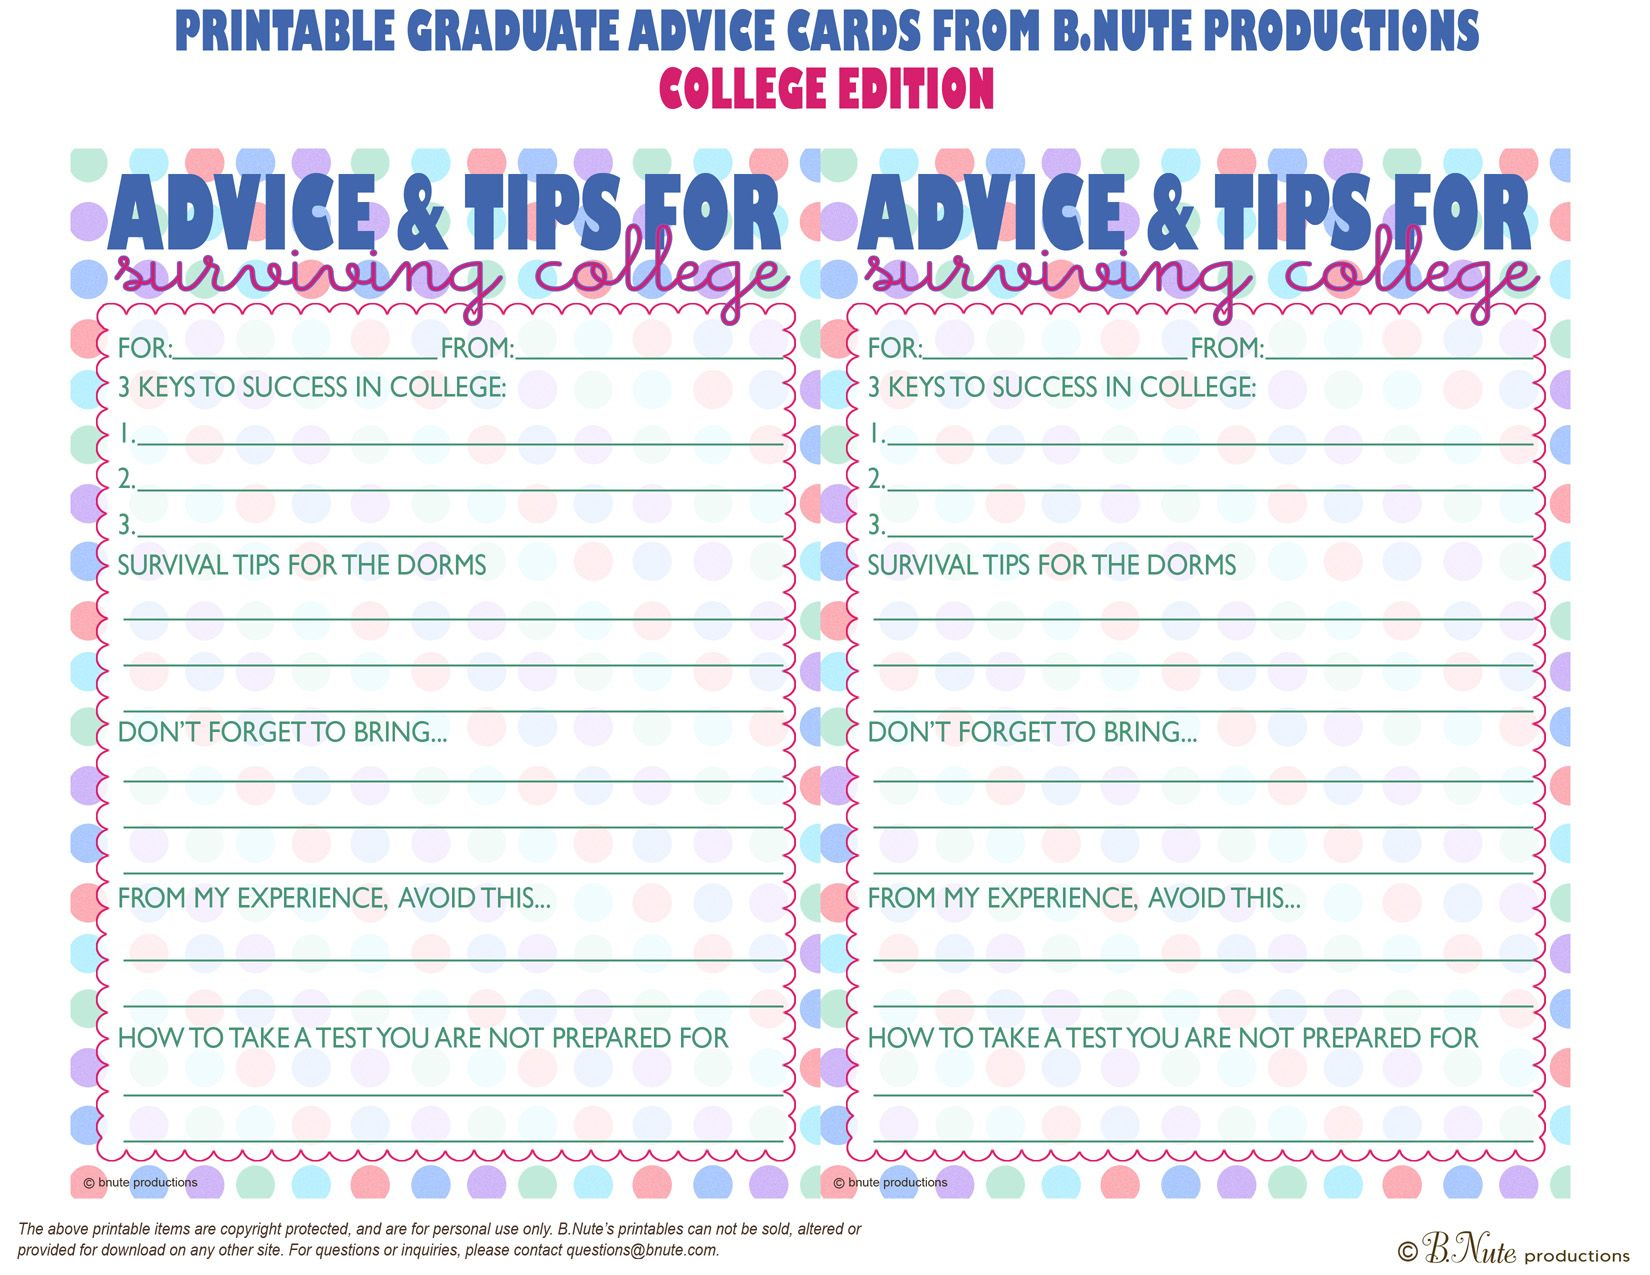 Free Printable Graduate Advice Cards